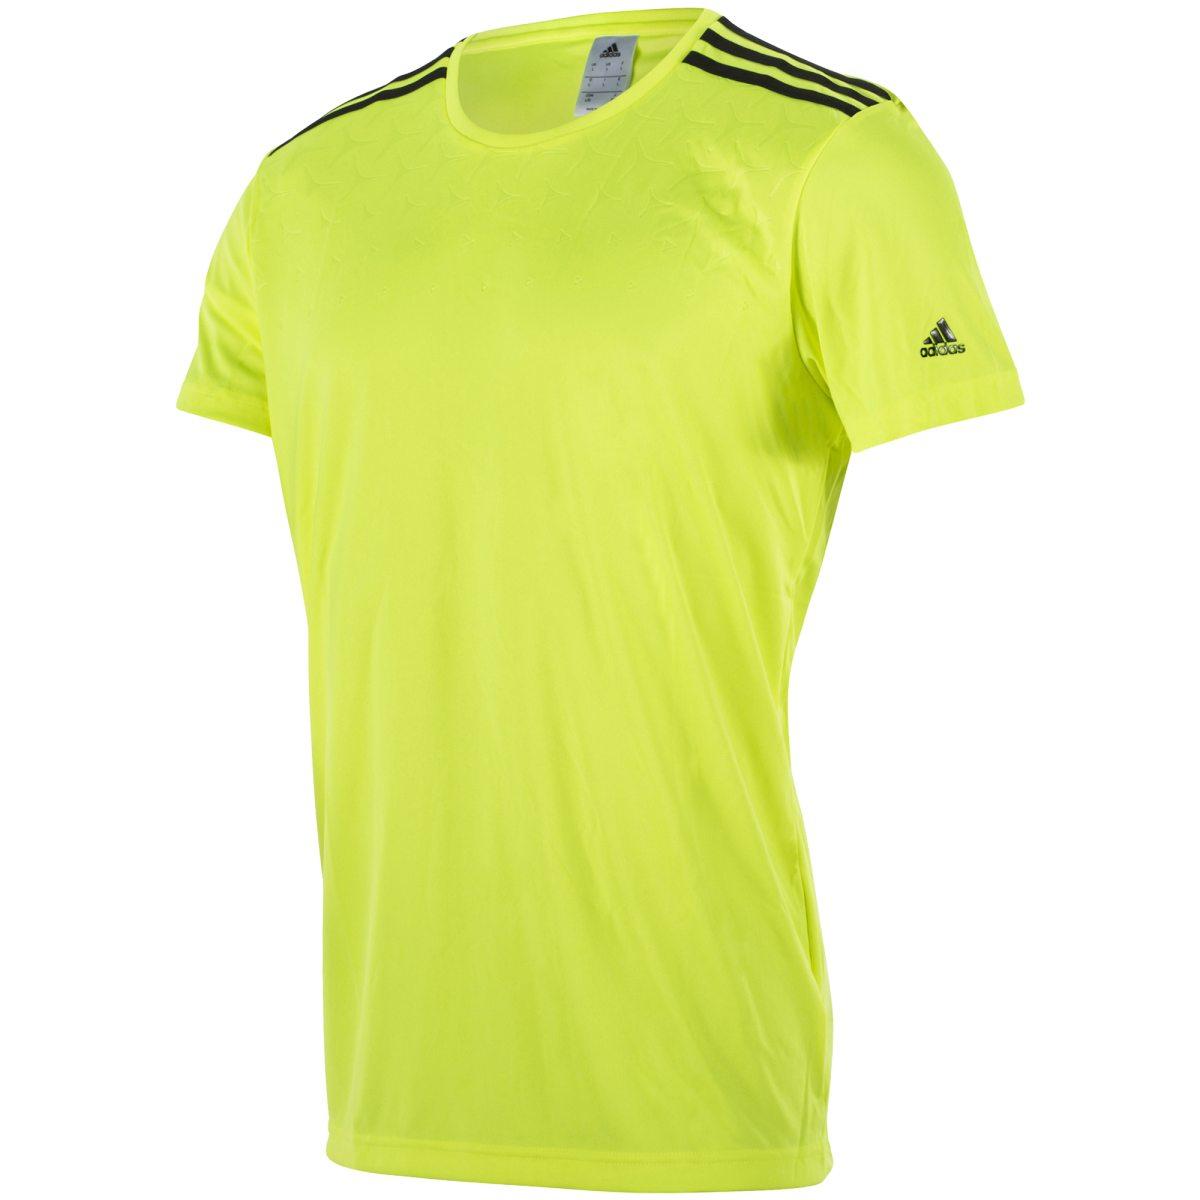 adidas ace poly tee träningströja senior t shirts b40ba3e08f